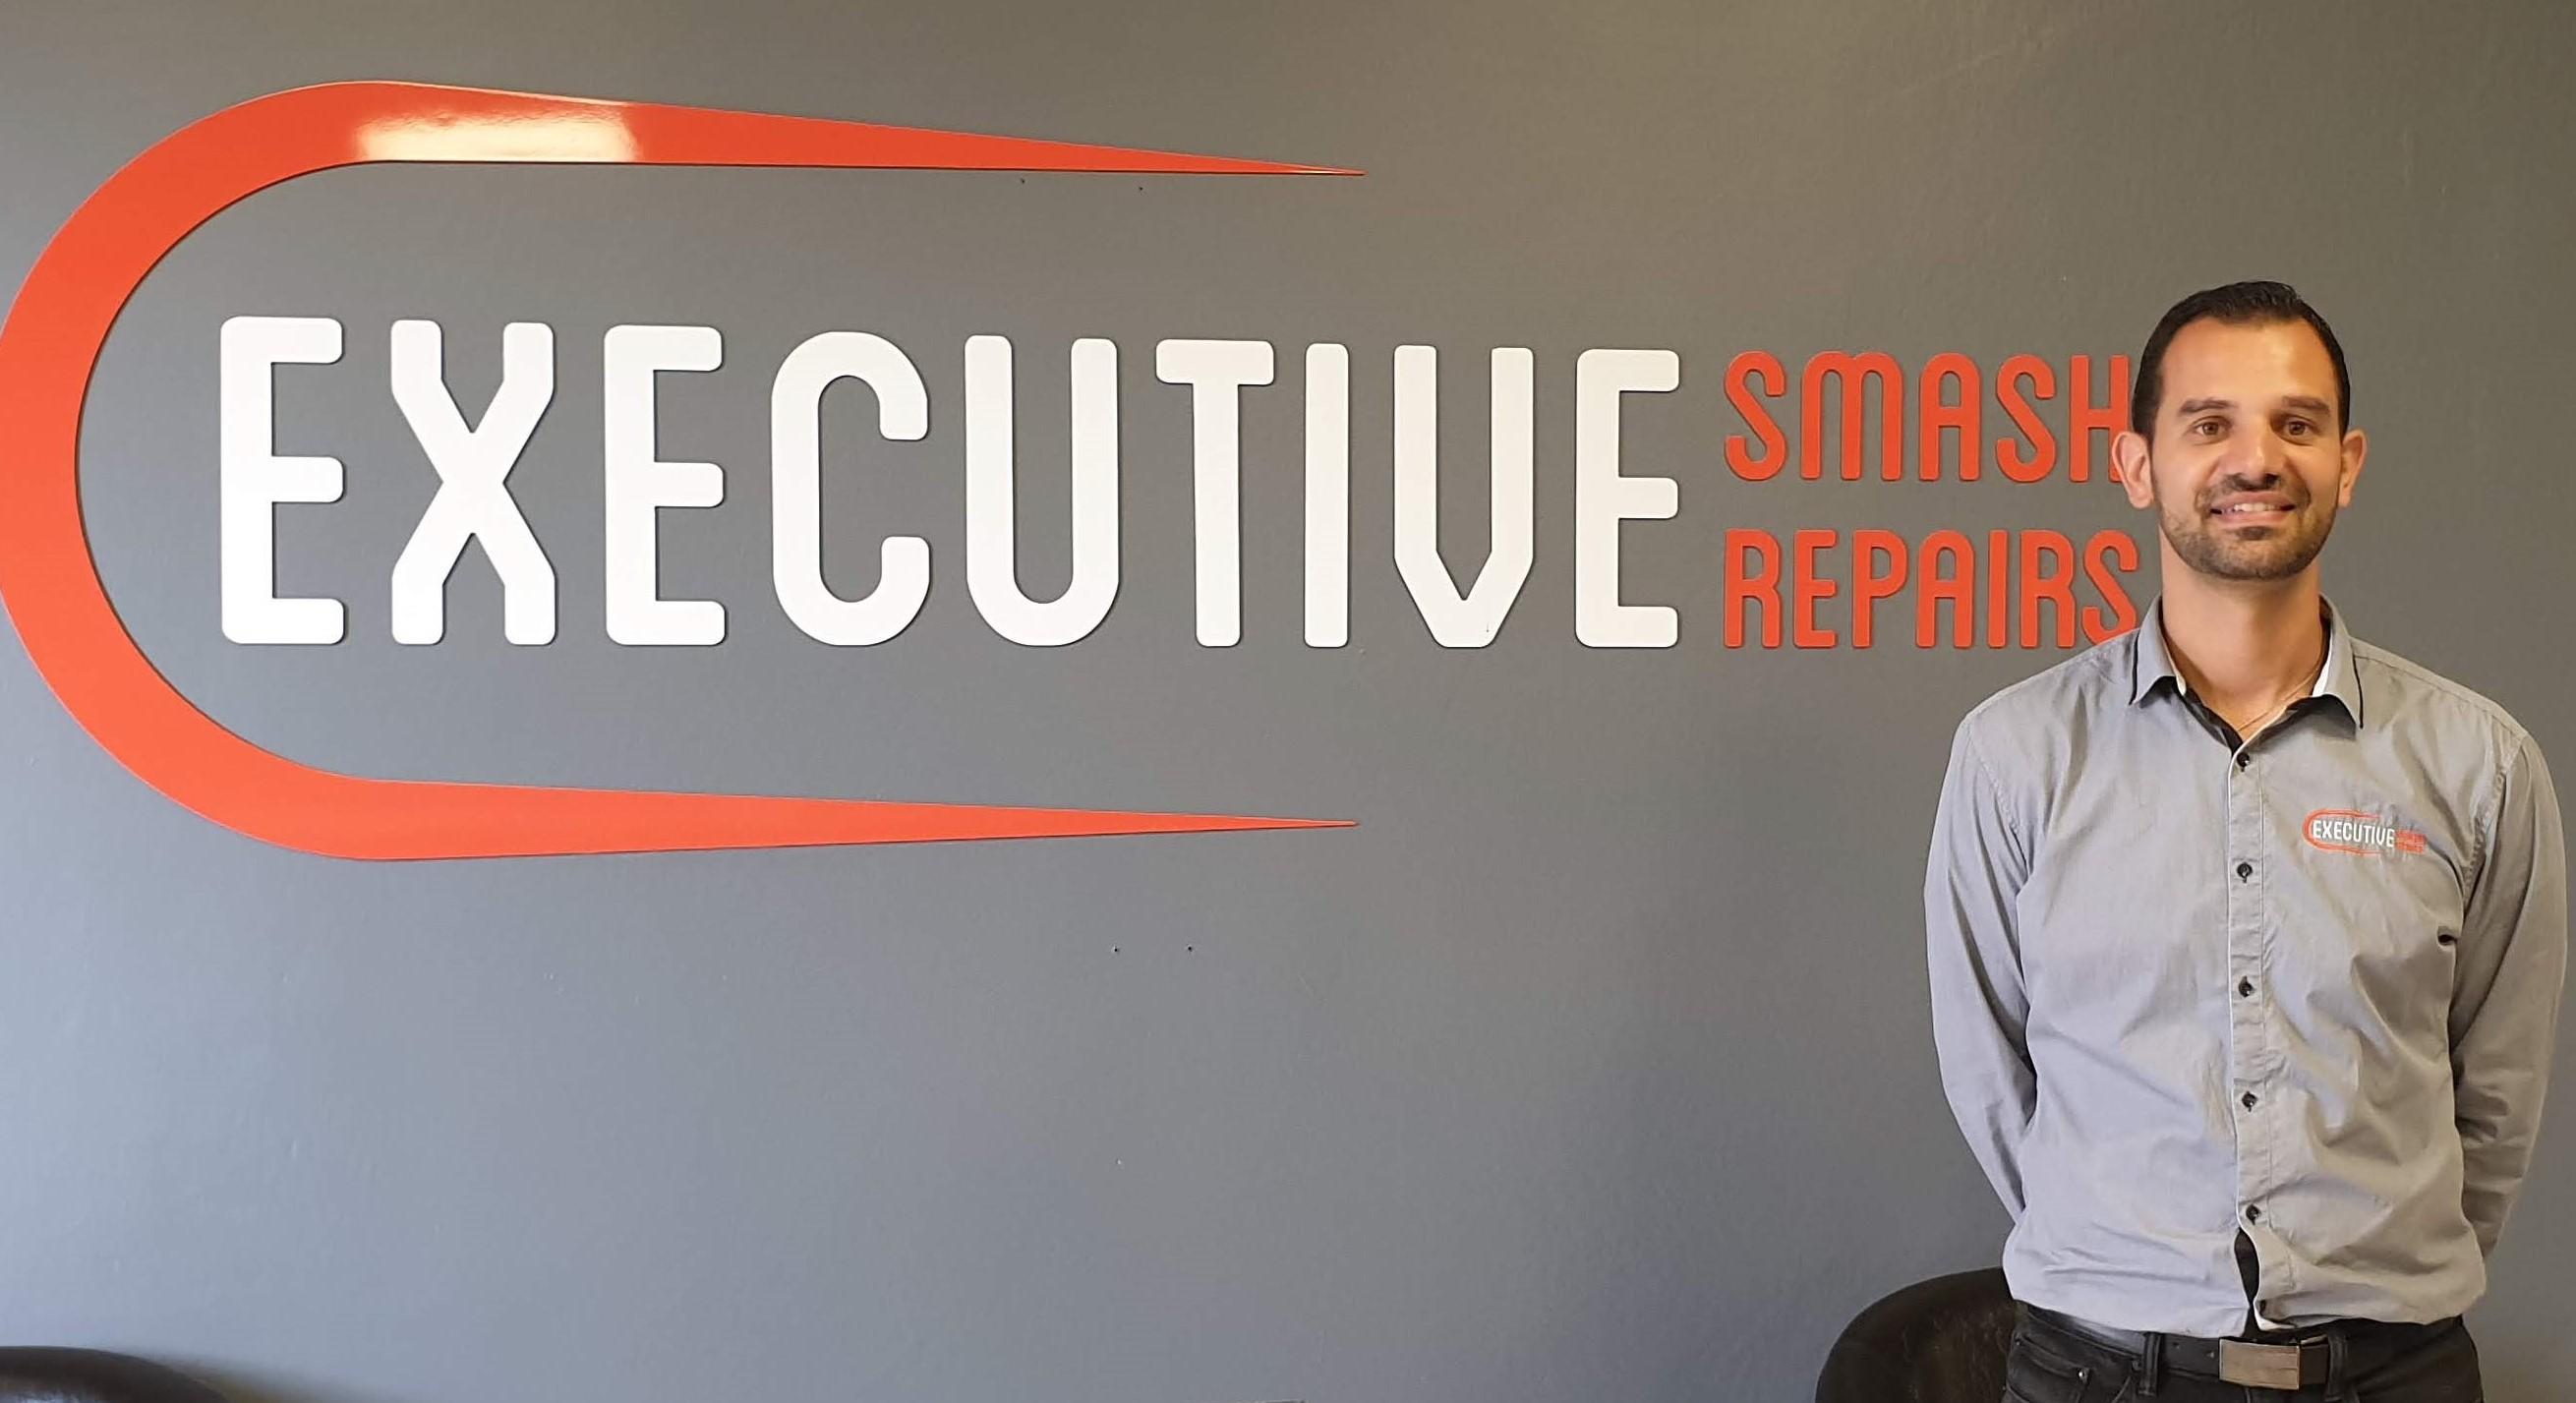 Executive Smash Repairs Photos